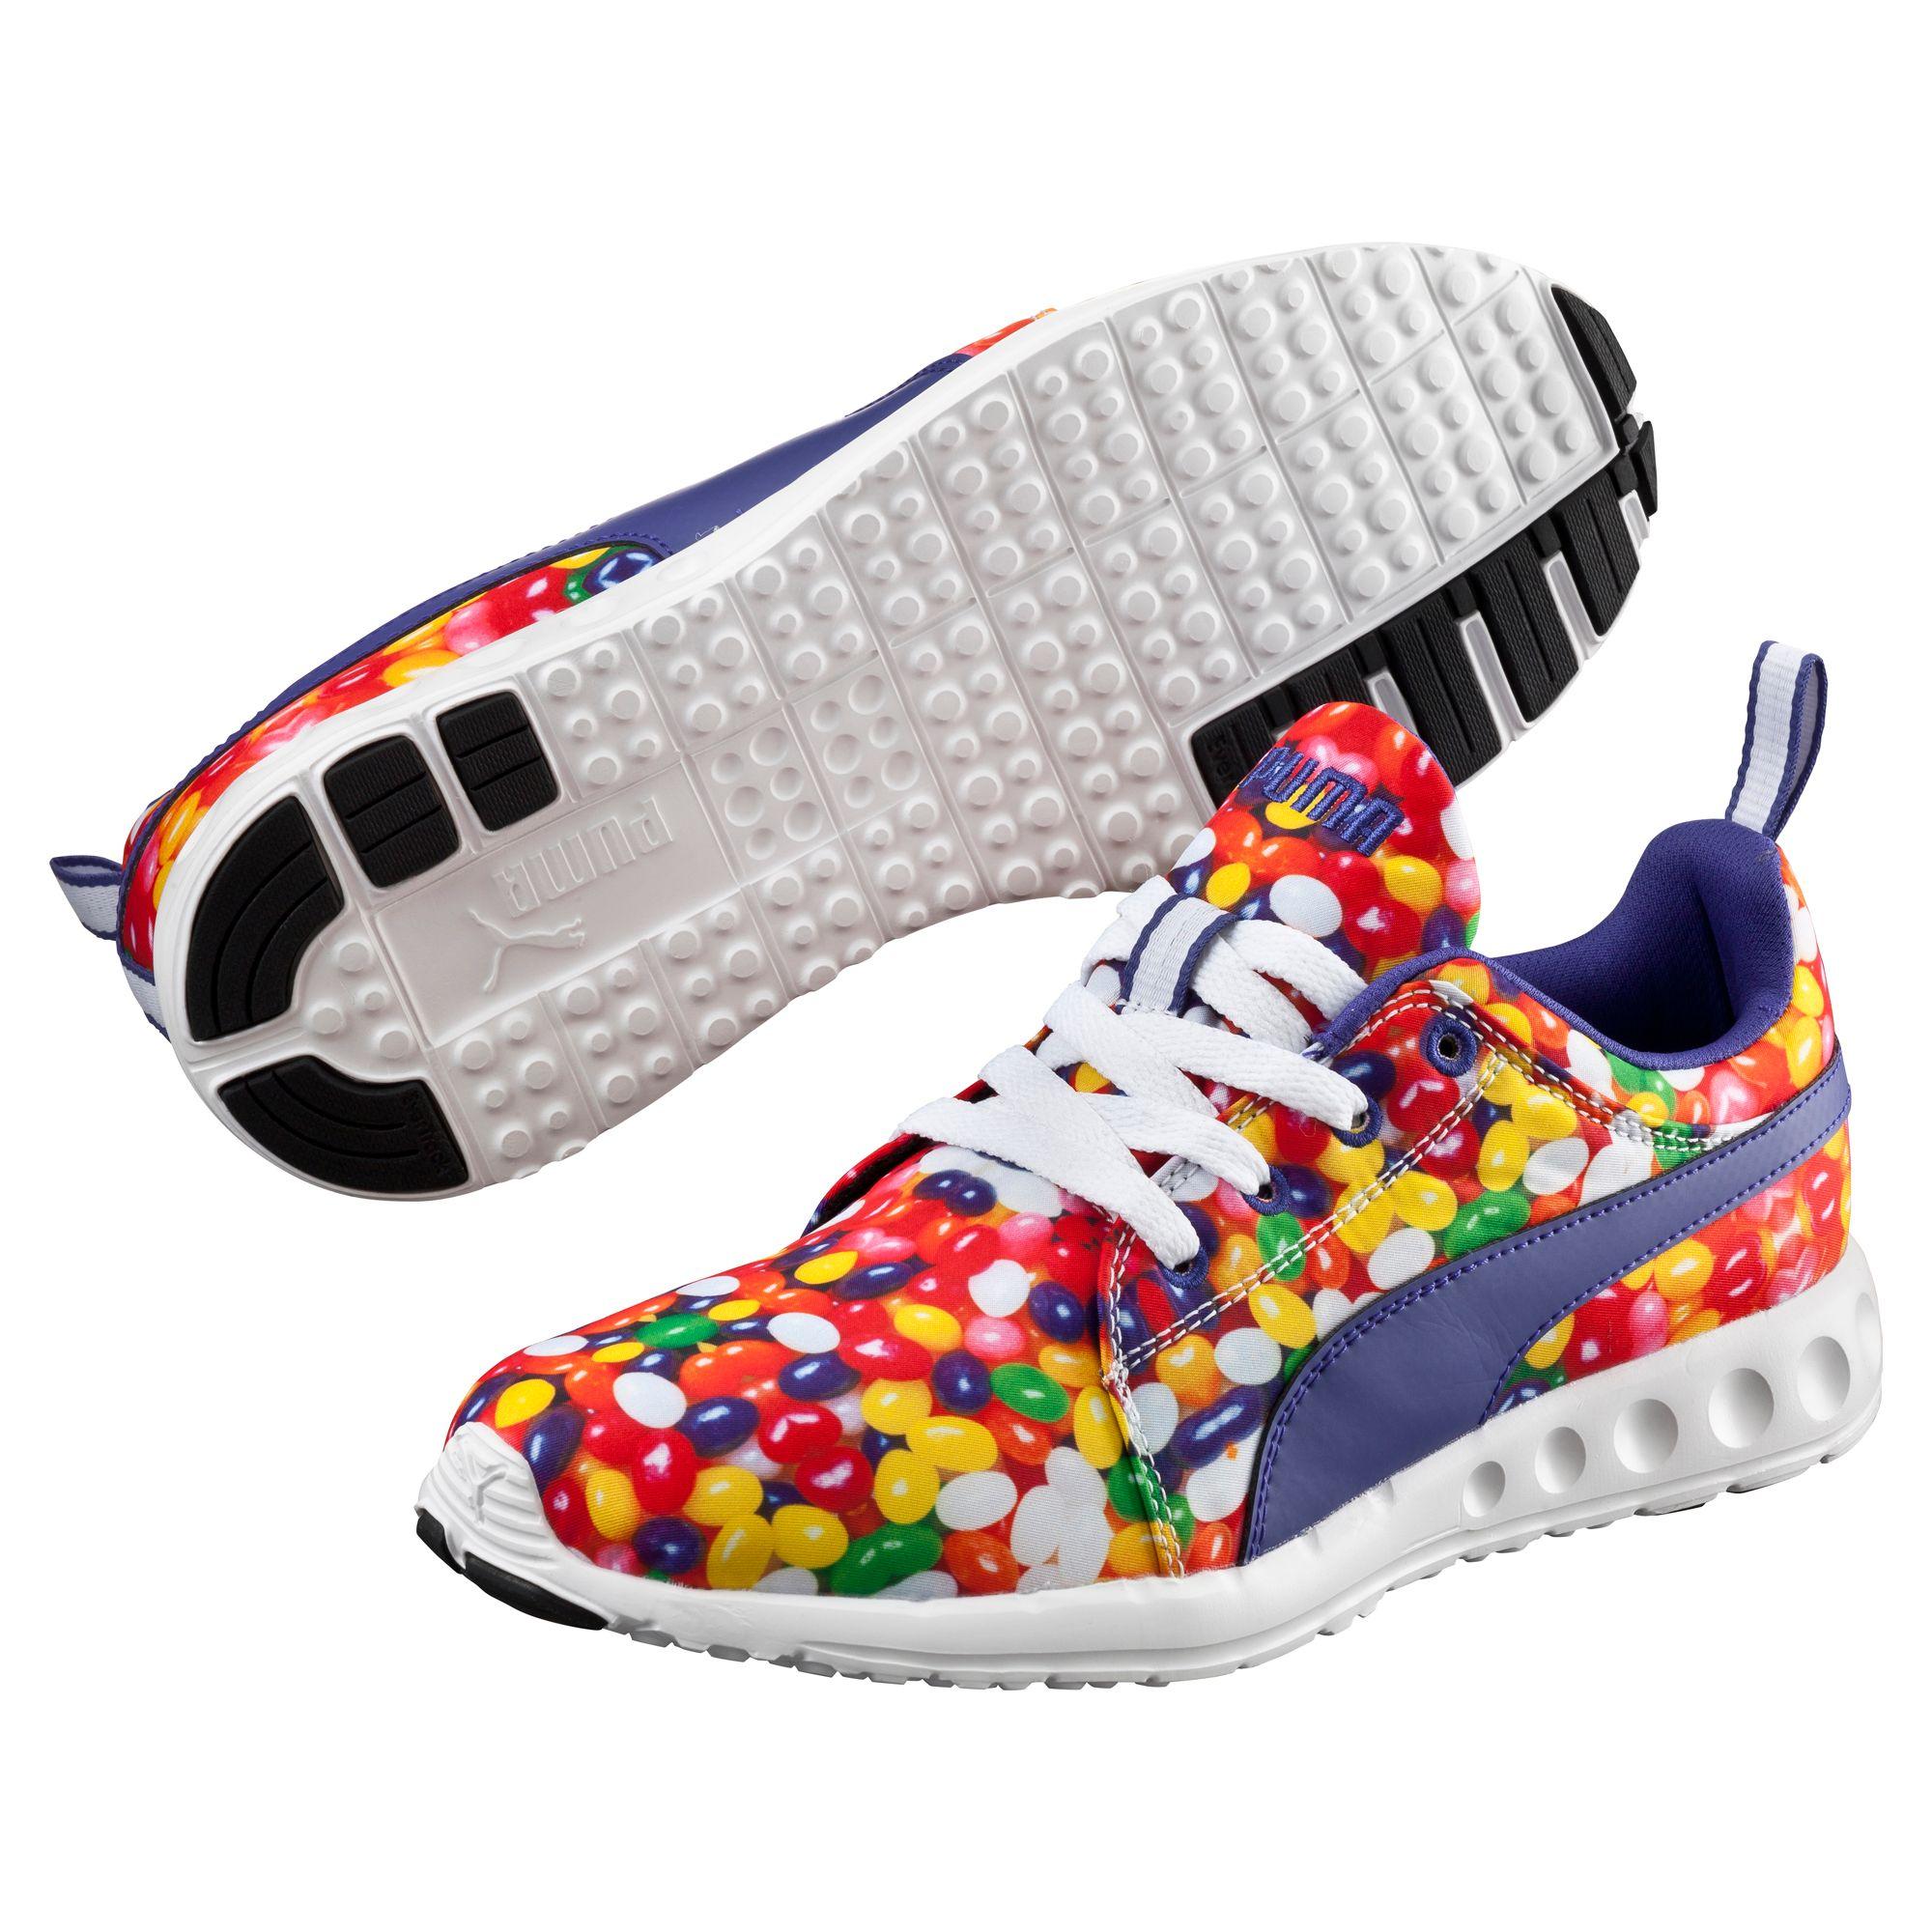 puma shoes women radio sonde data format